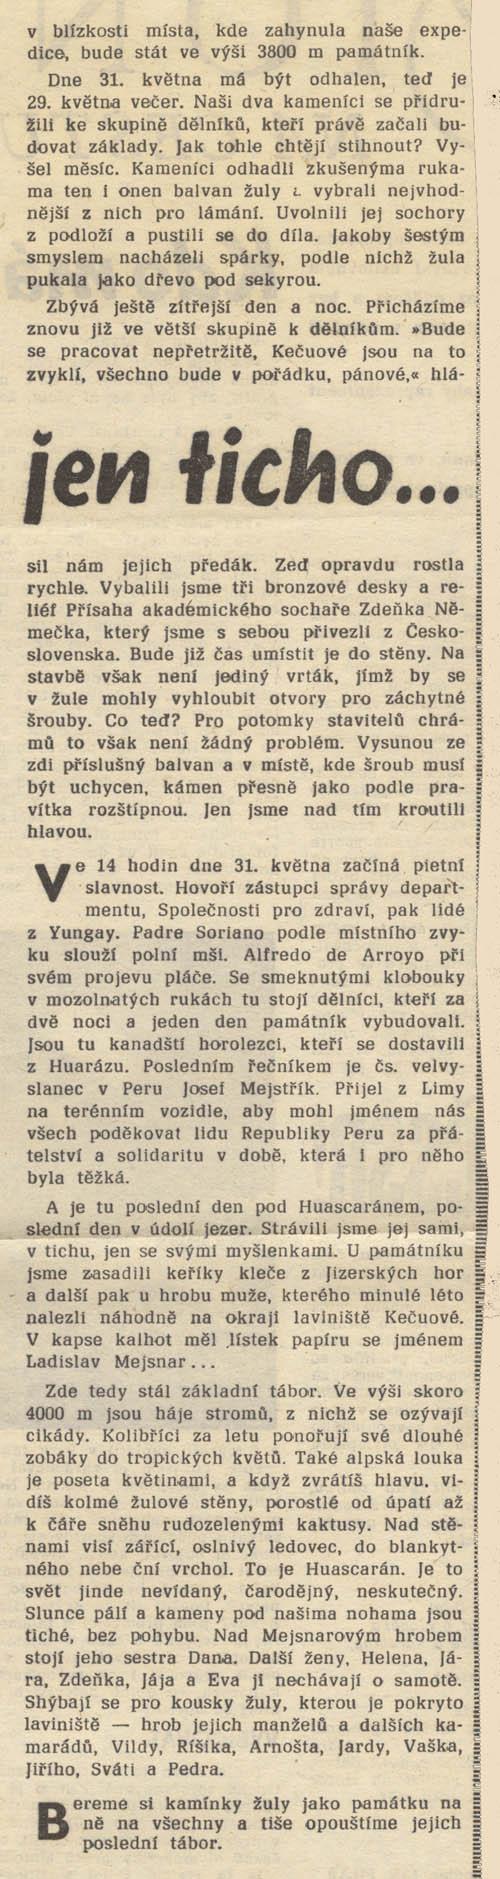 ČS sport 18. 8. 1972